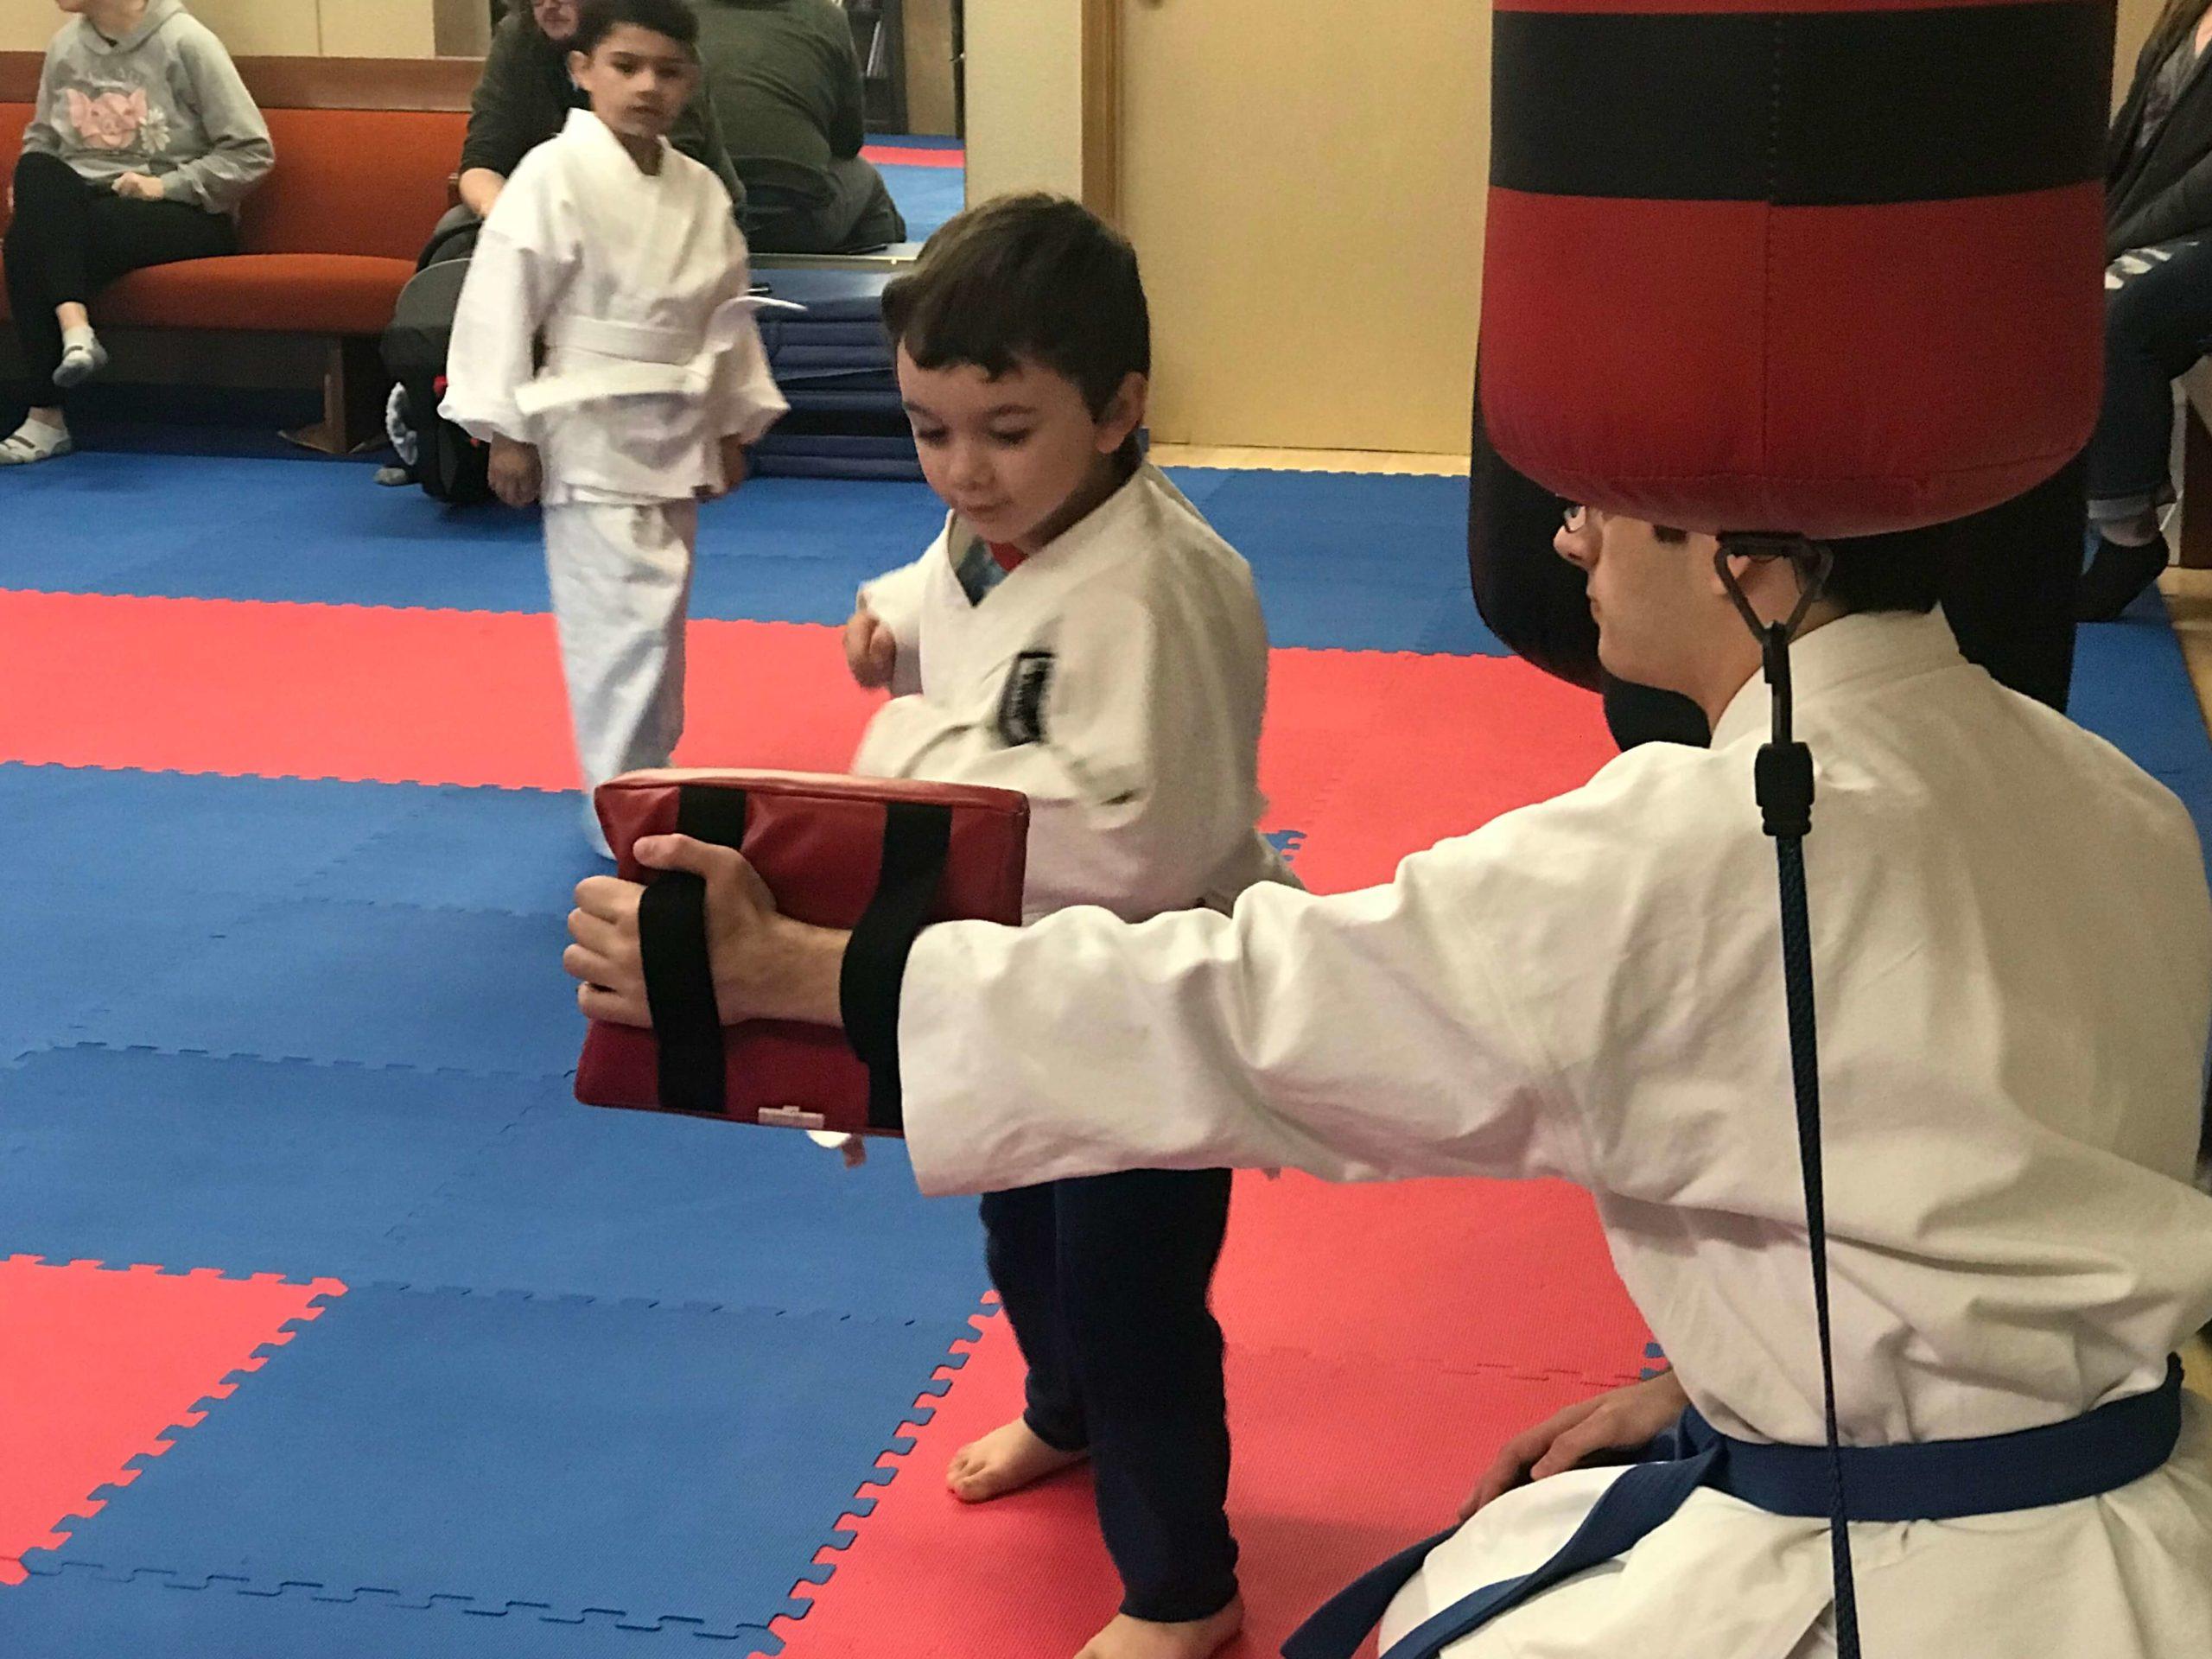 IMG 2775 1 Scaled, Rising Tide Karate